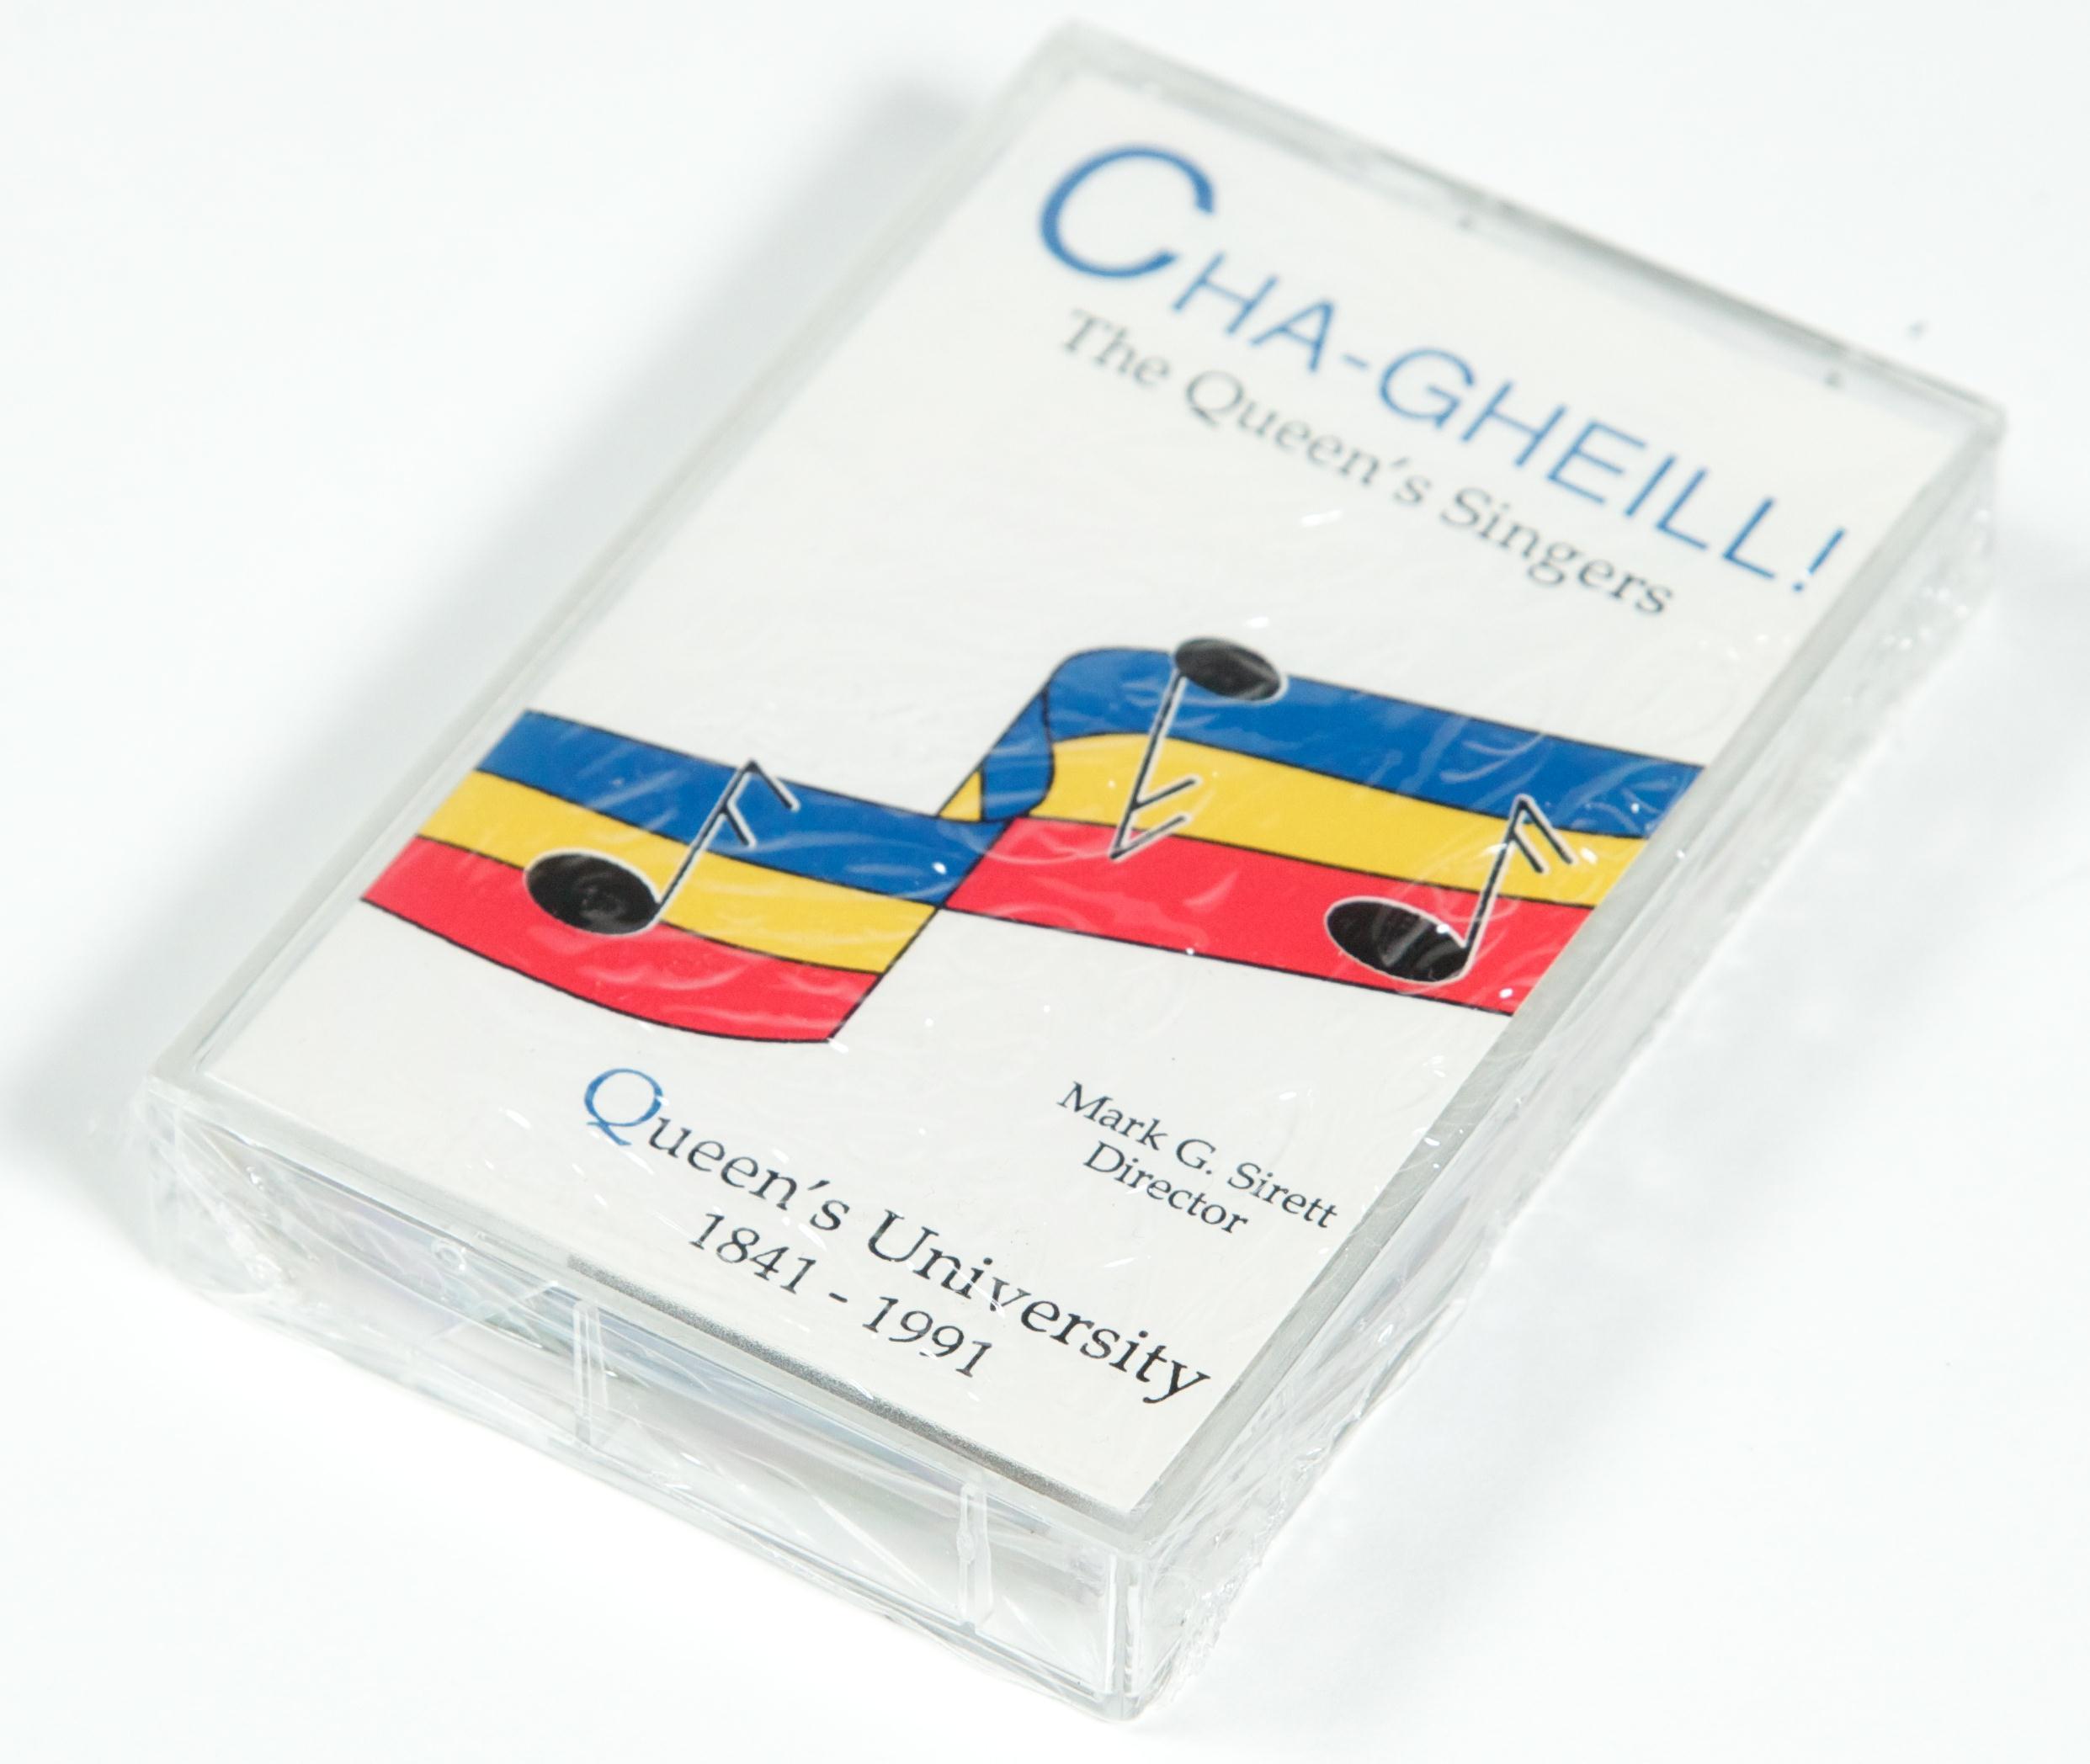 Queen's Singers Cassette Tape image